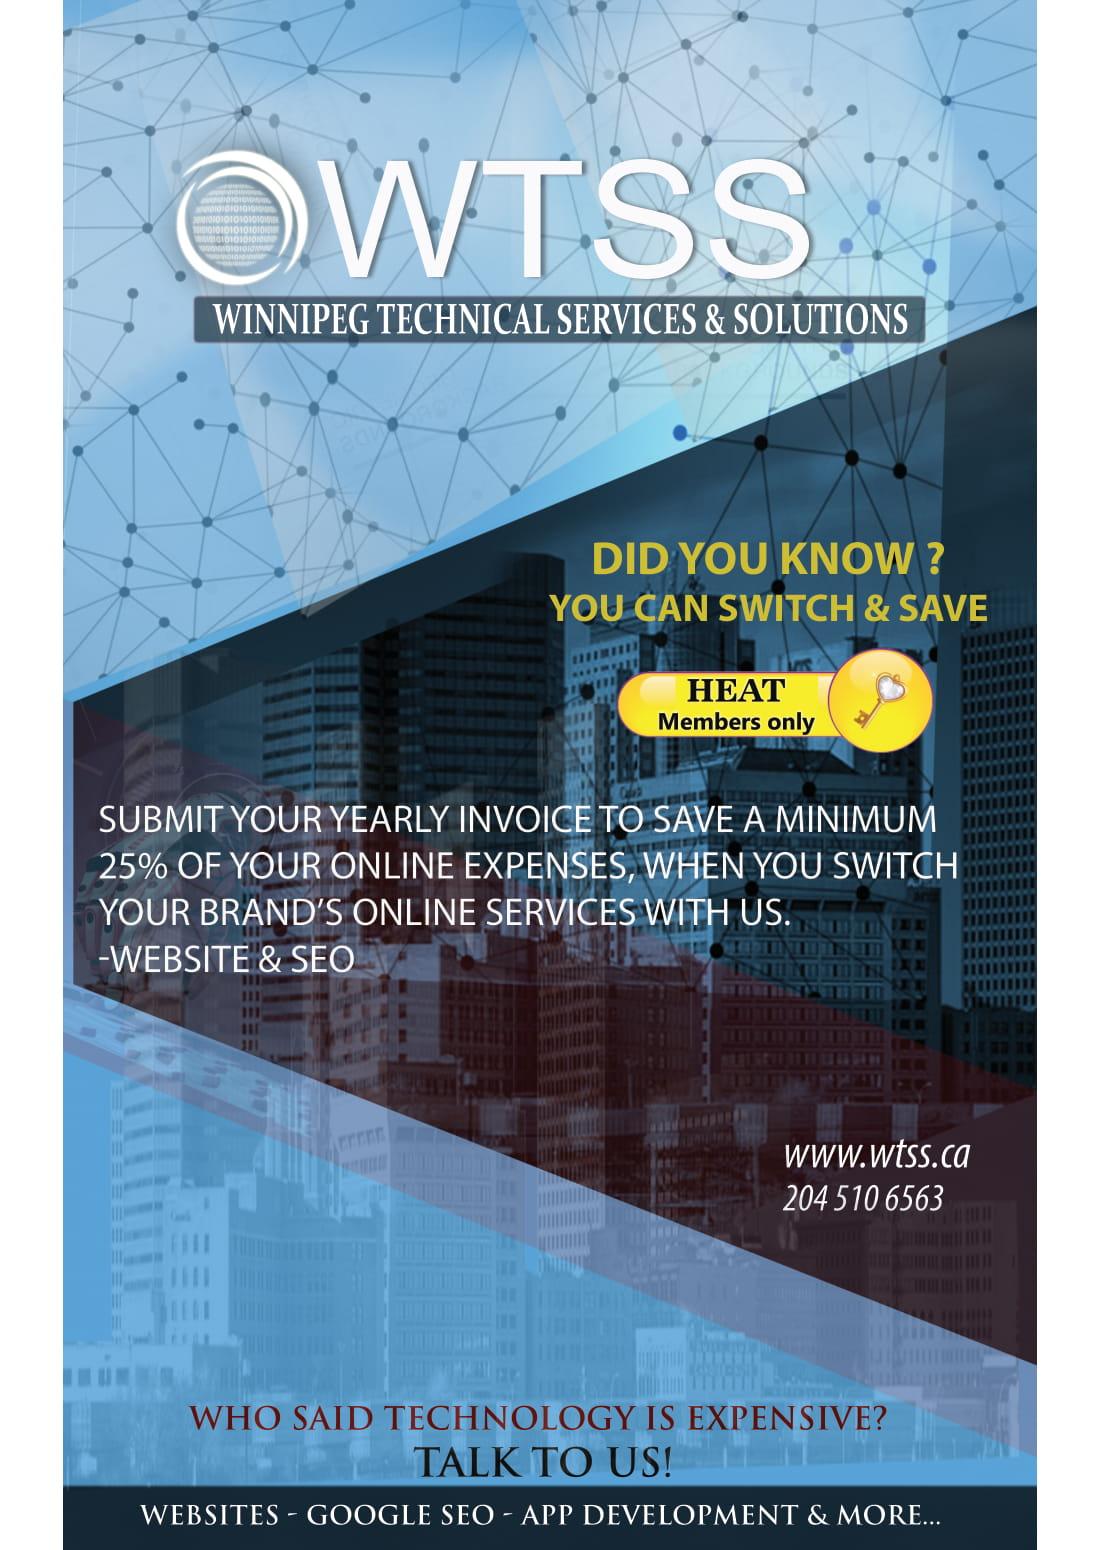 Winnipeg Technical Services & Solutions